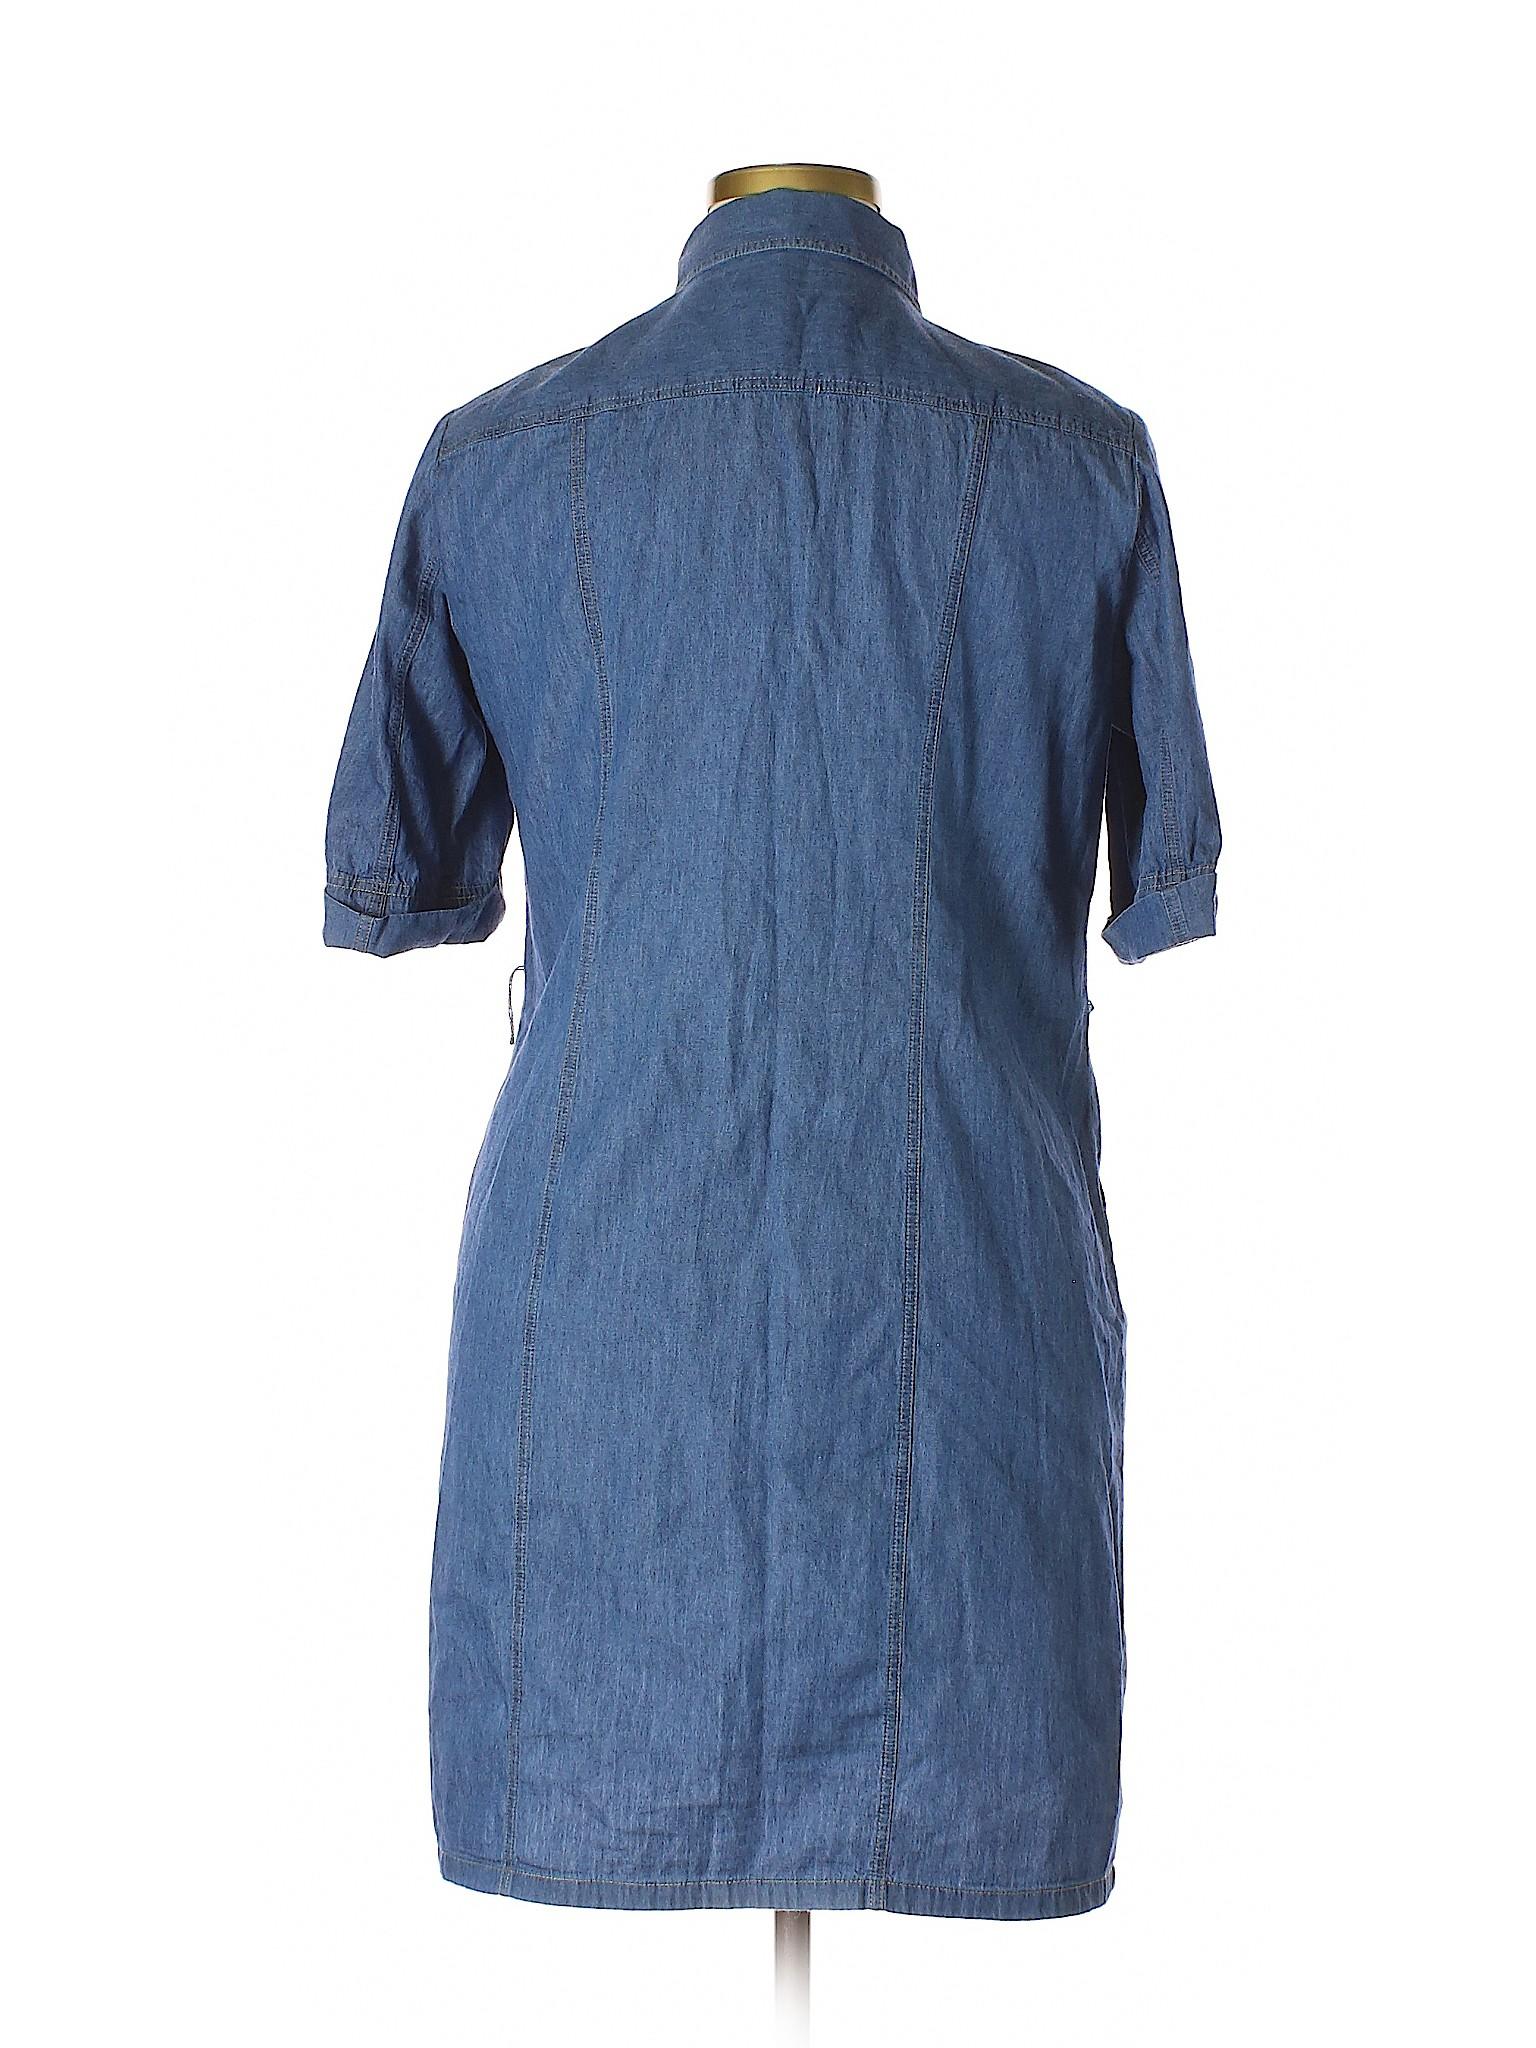 Pendleton Pendleton Selling Dress Selling Selling Casual Casual Dress Pendleton 6x7qw5f